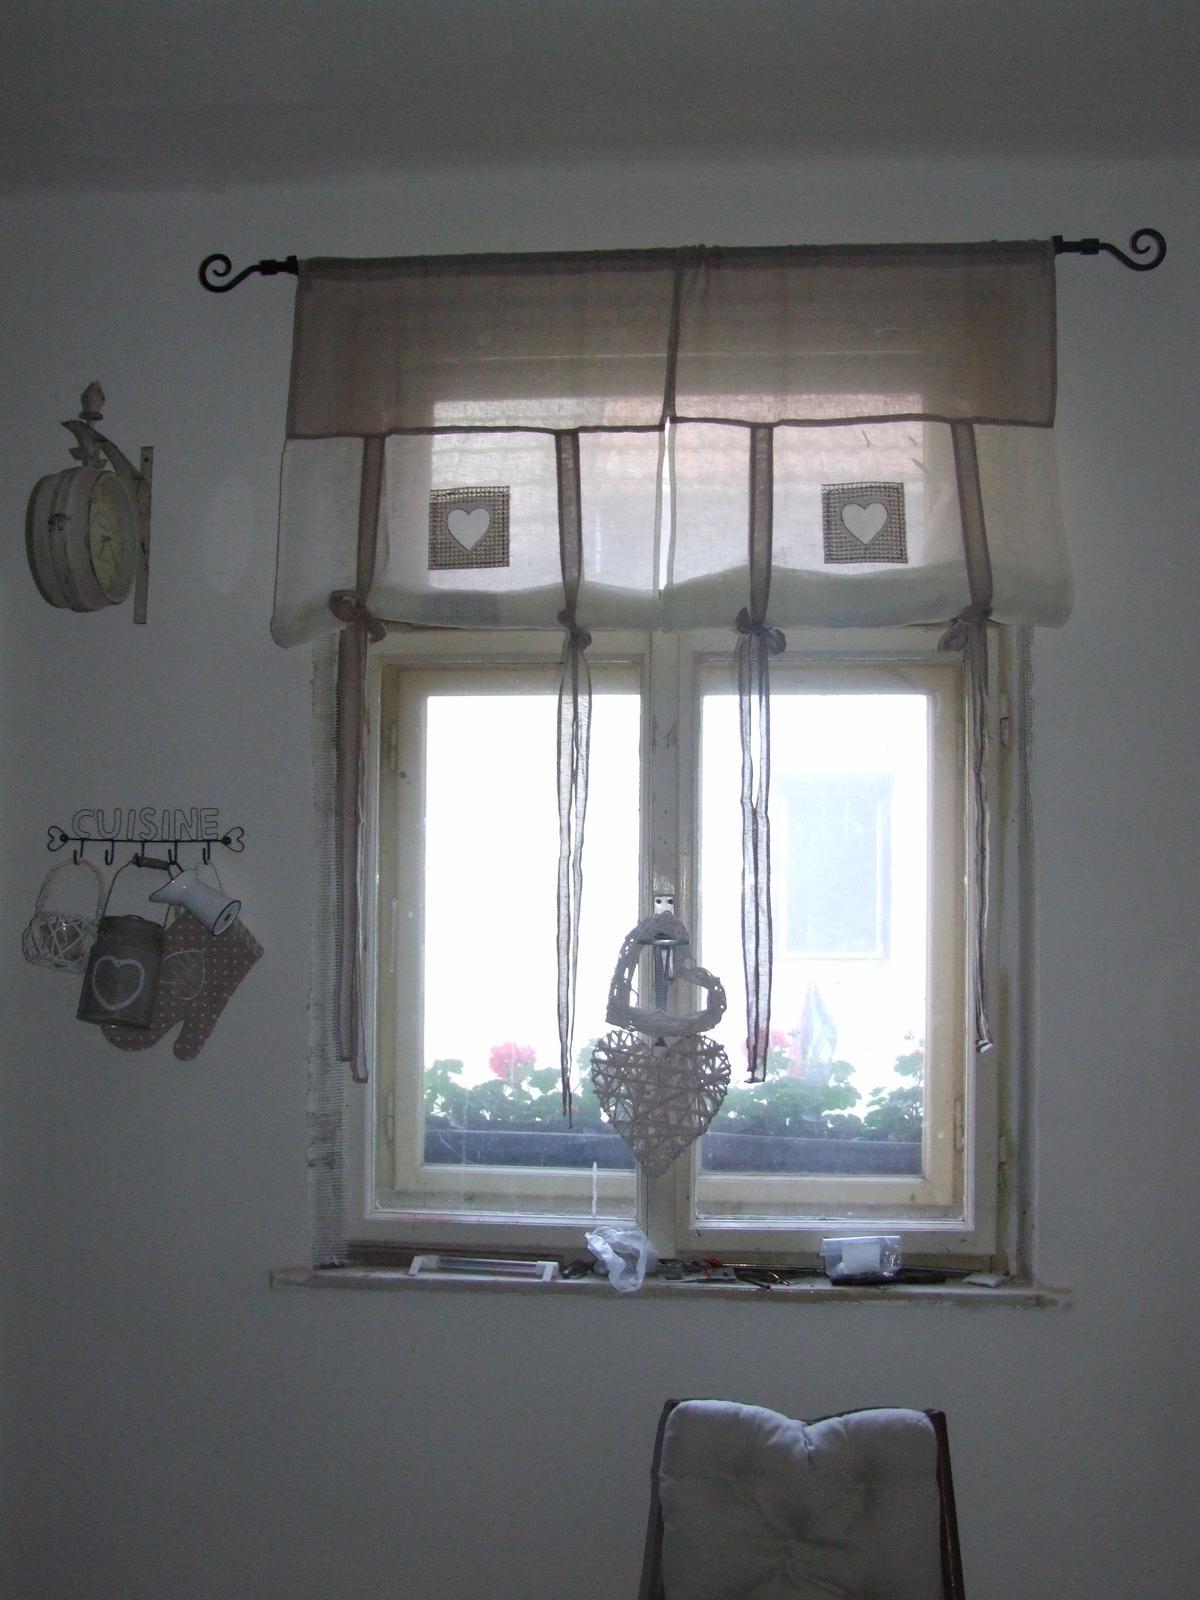 Bejvavalo - okno v kuchyni este nedorobene, musim obrusit a bude len drevene a odpratat naradie he:)